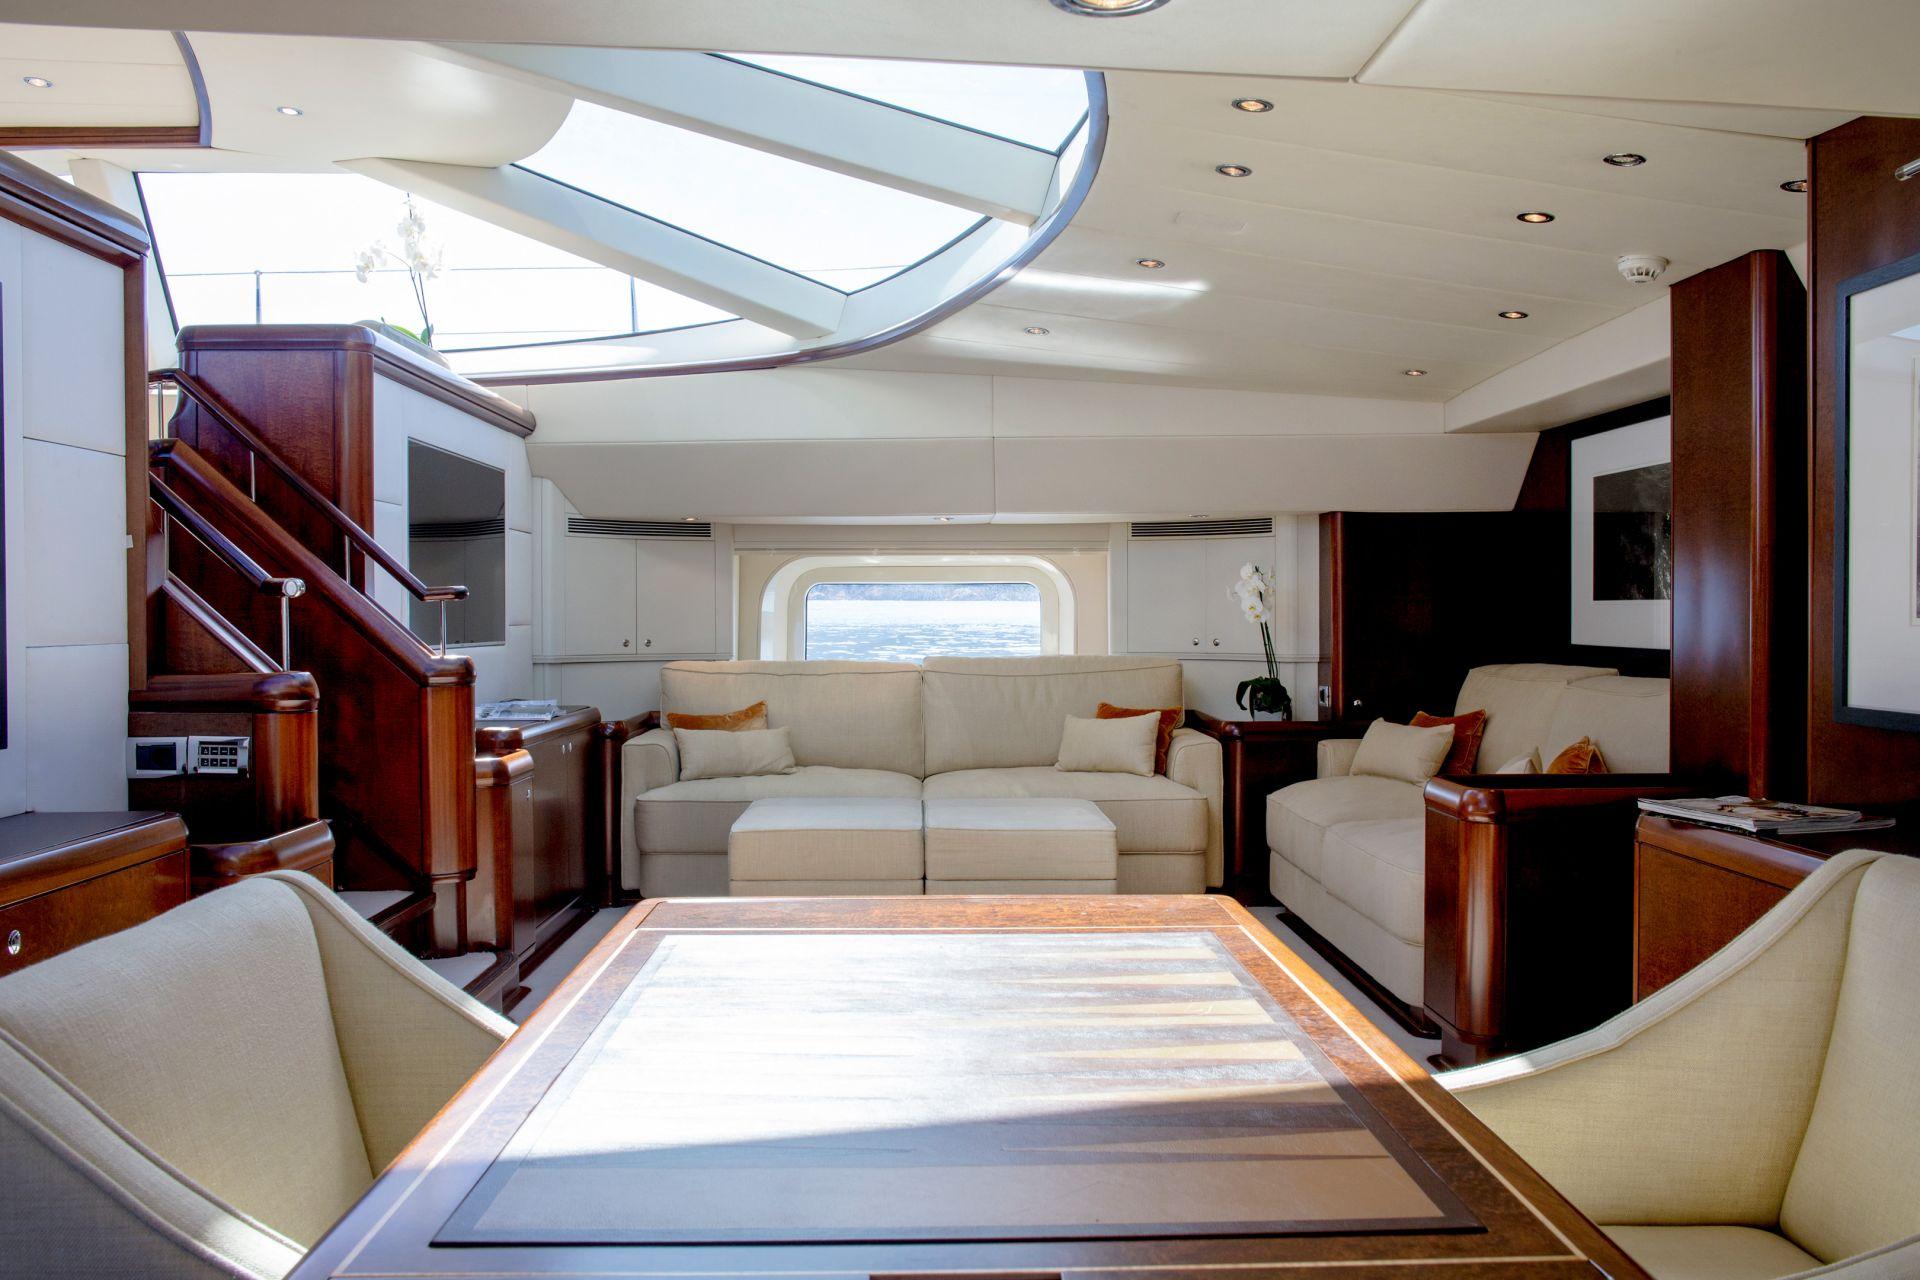 fitzroy image gallery  u2013 luxury yacht browser